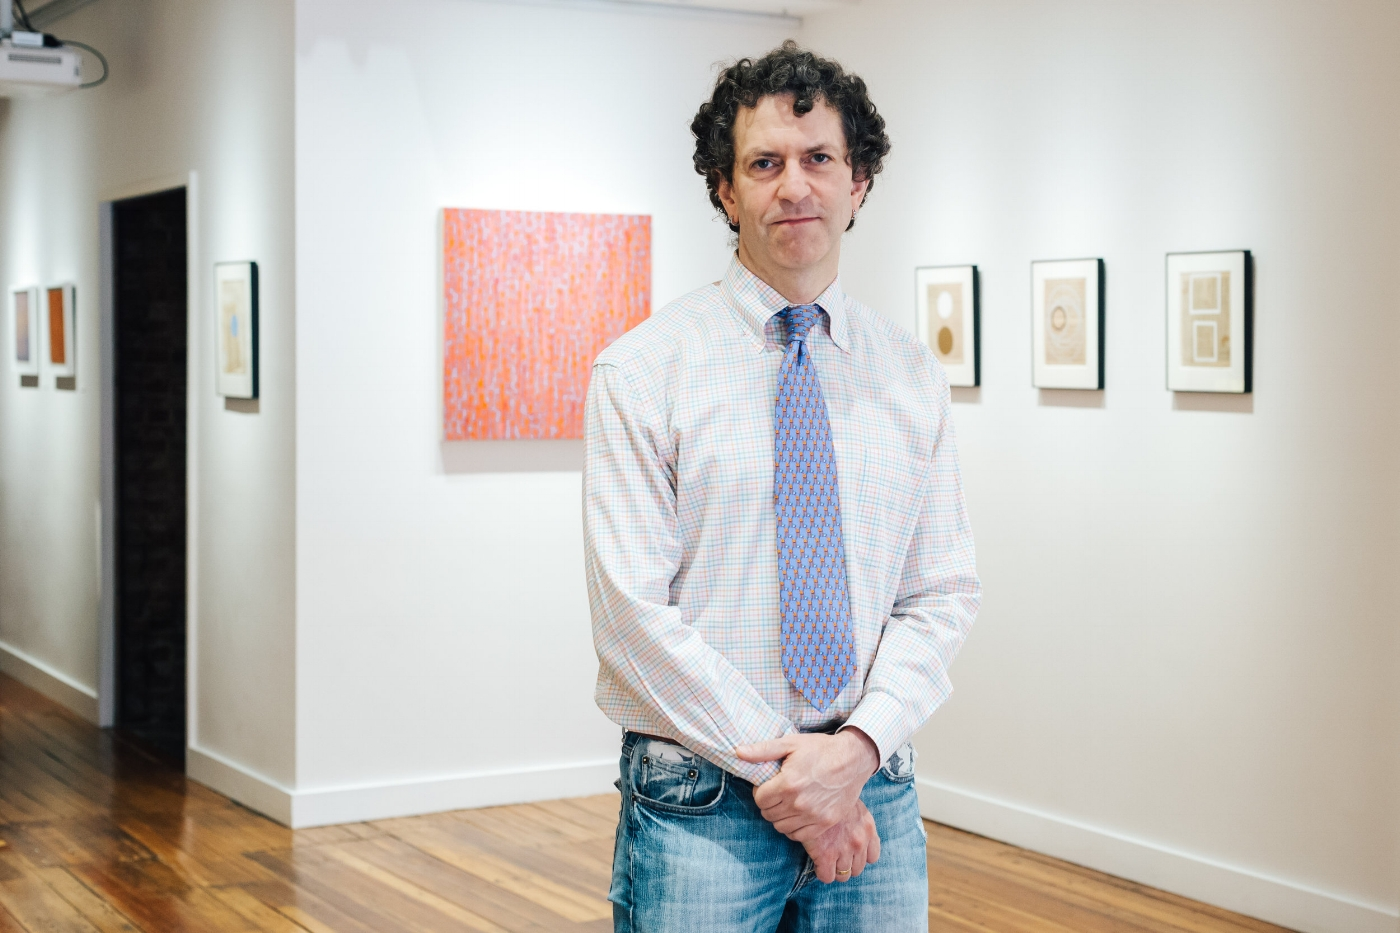 Trident Gallery owner Matthew Swift. (Photograph by Dana Wendt)